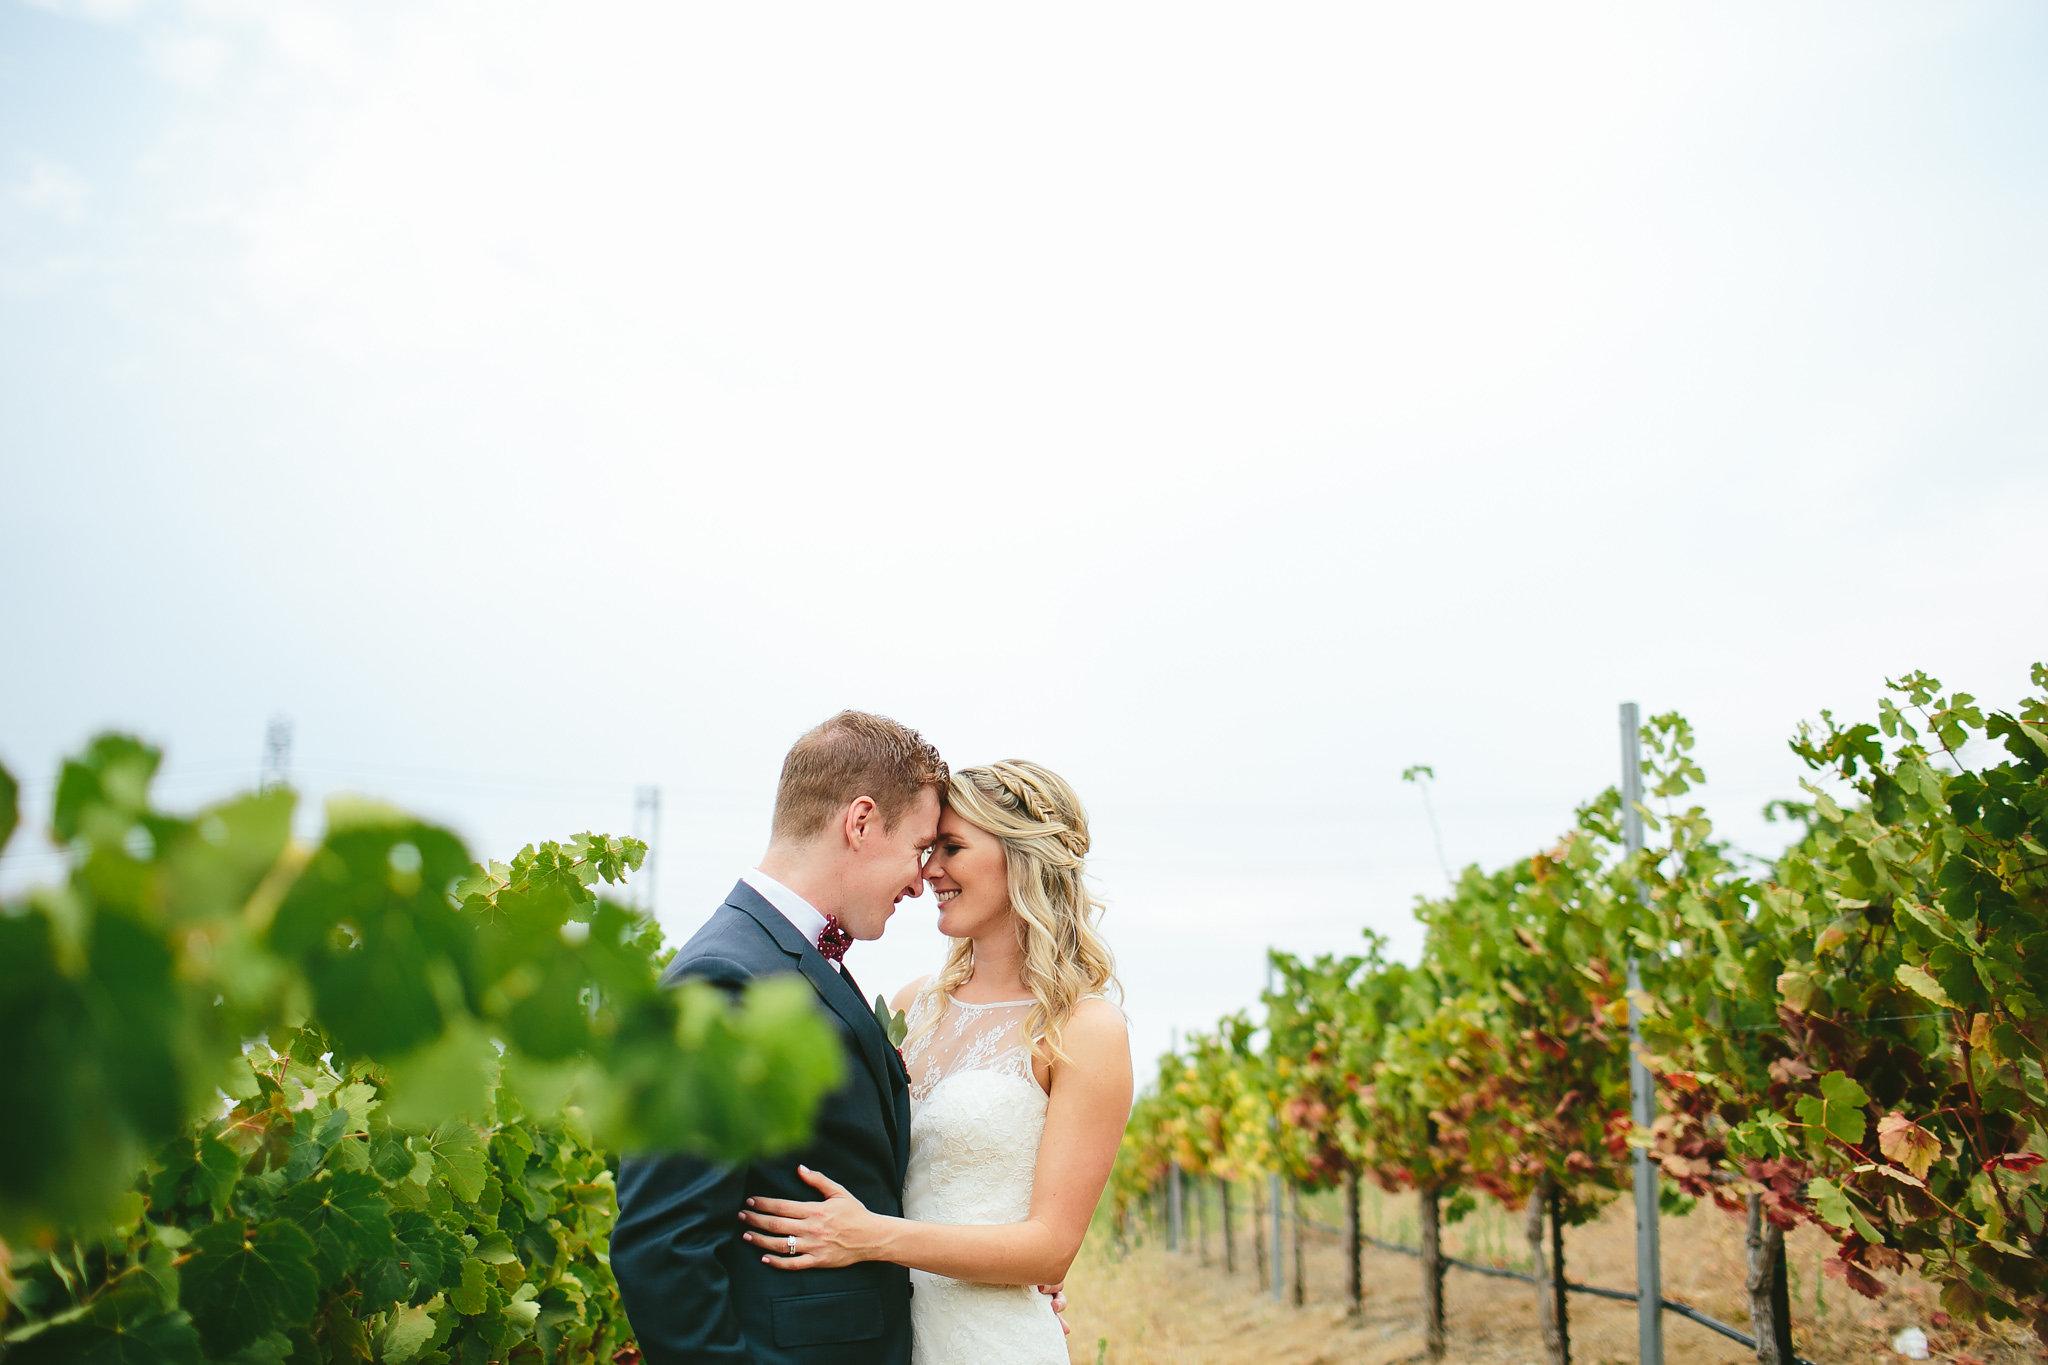 Kristen+Nick-WEDDING_WEB-563.jpg